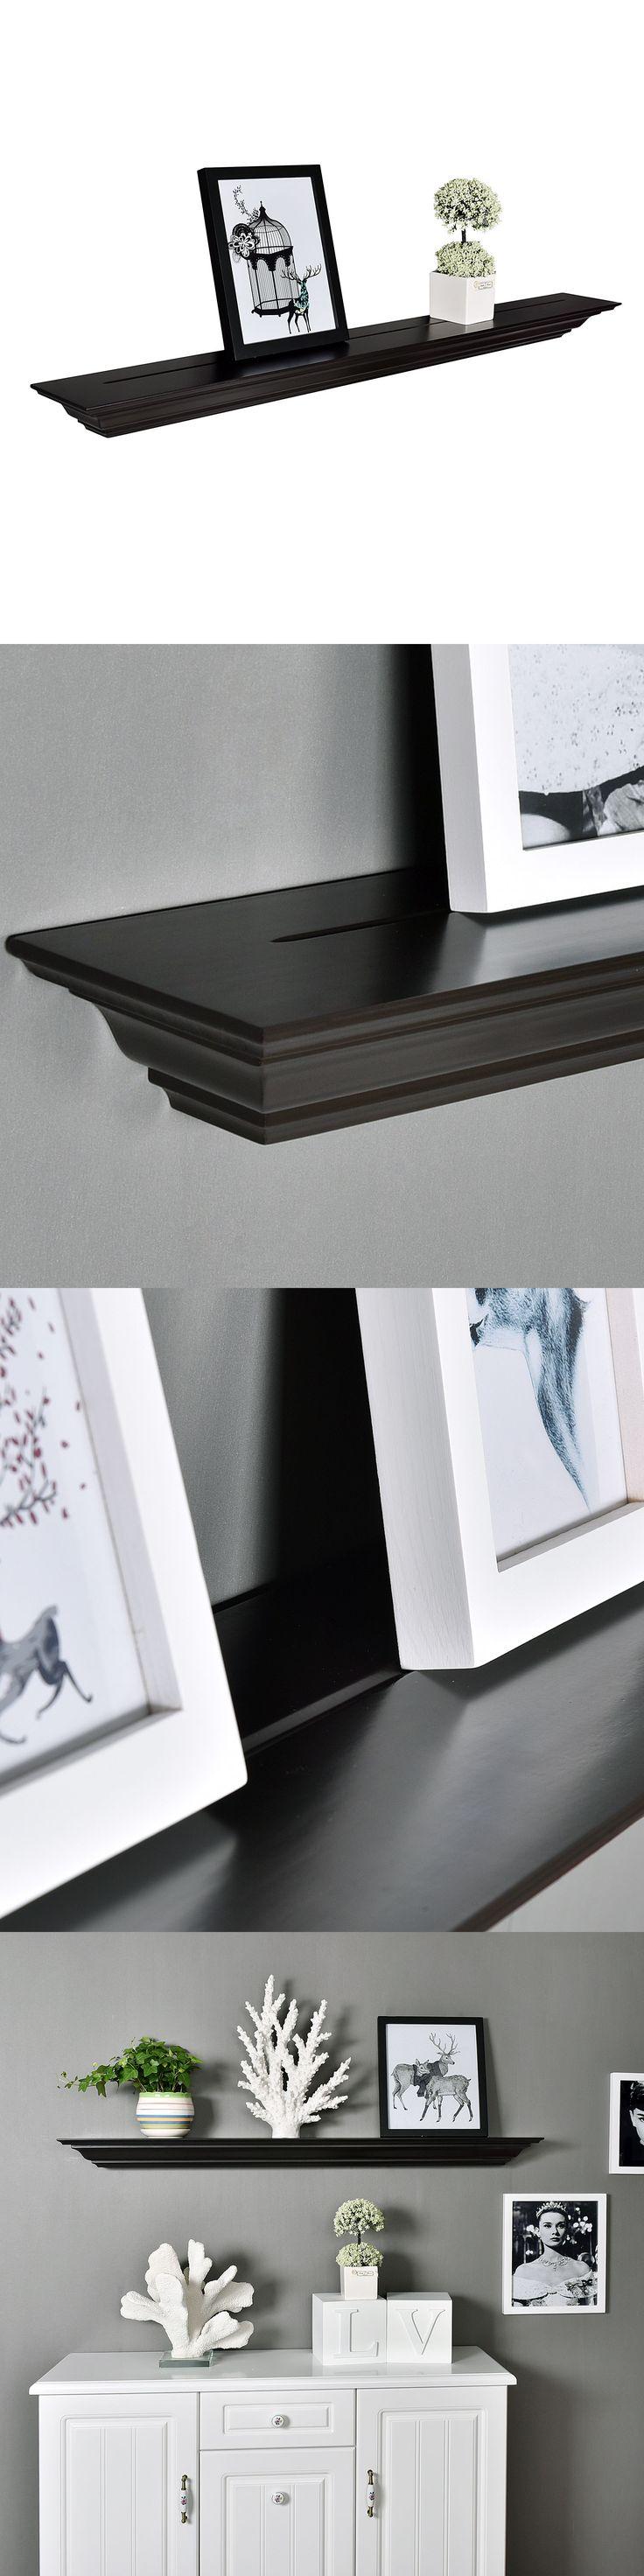 Wall Shelves 45501: Welland Corona Crown Molding Floating Wood Wall Shelf, 48-Inch, Espresso -> BUY IT NOW ONLY: $51.99 on eBay!